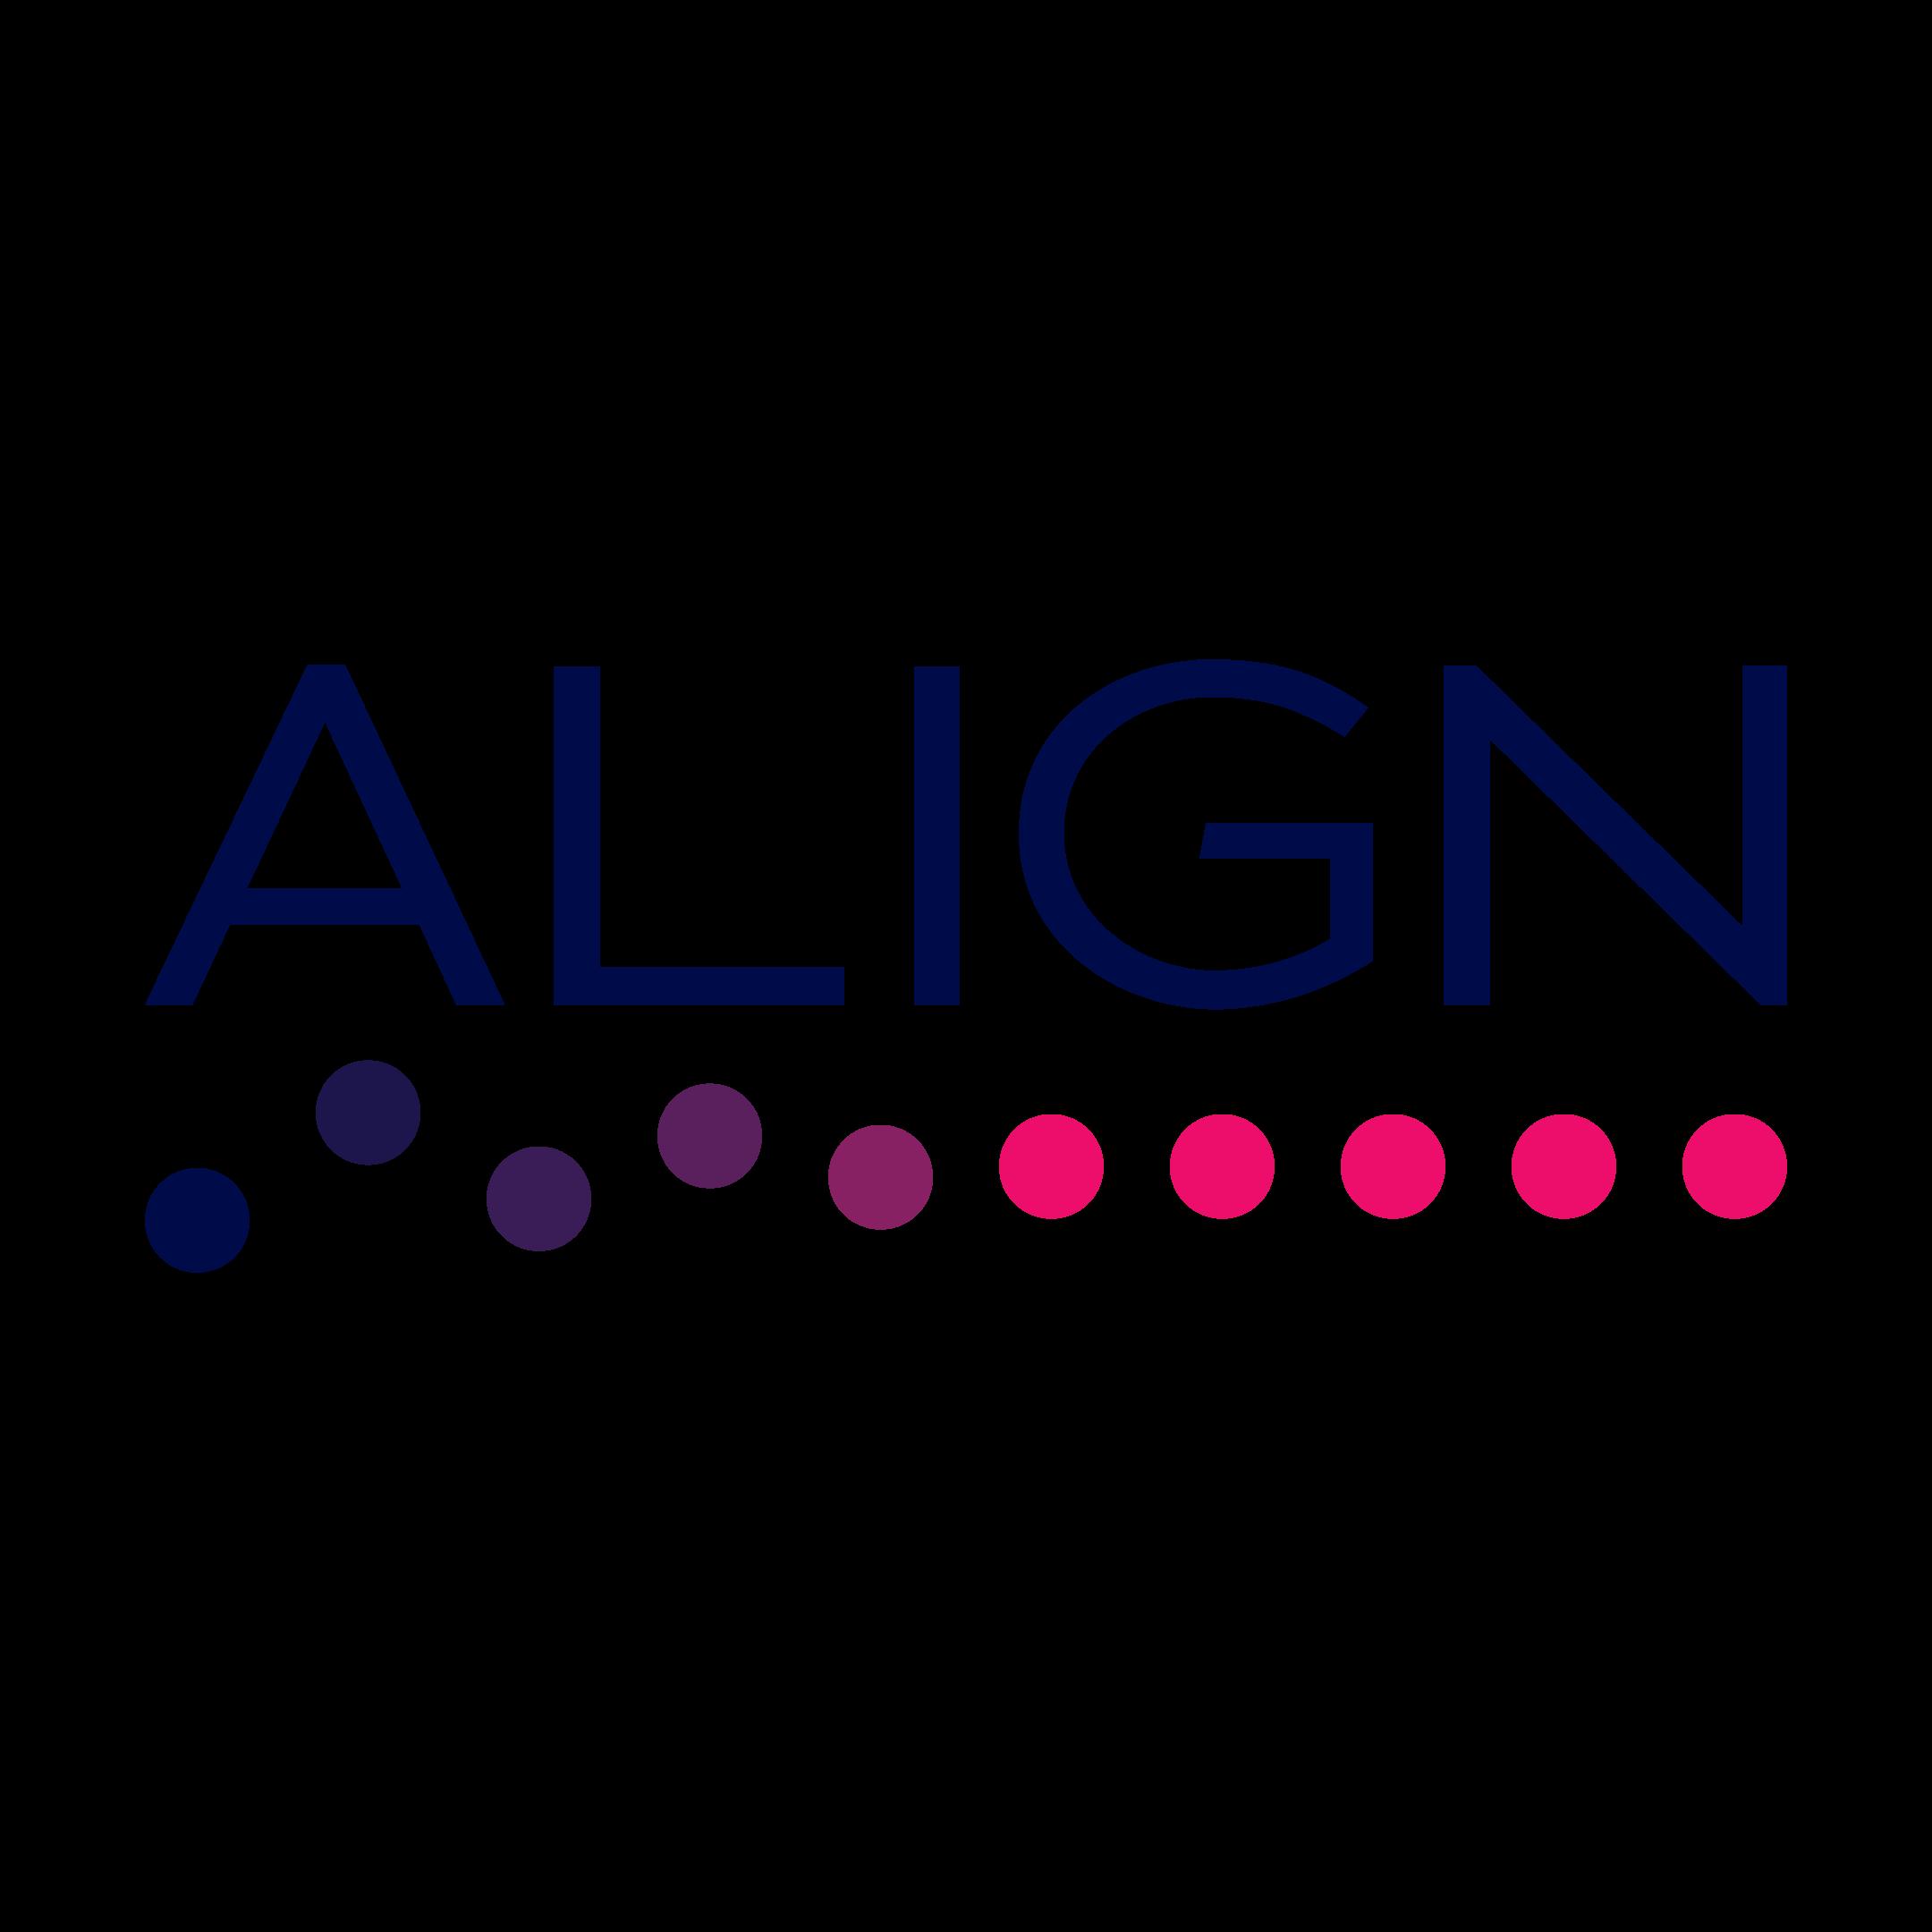 ALIGN_logo